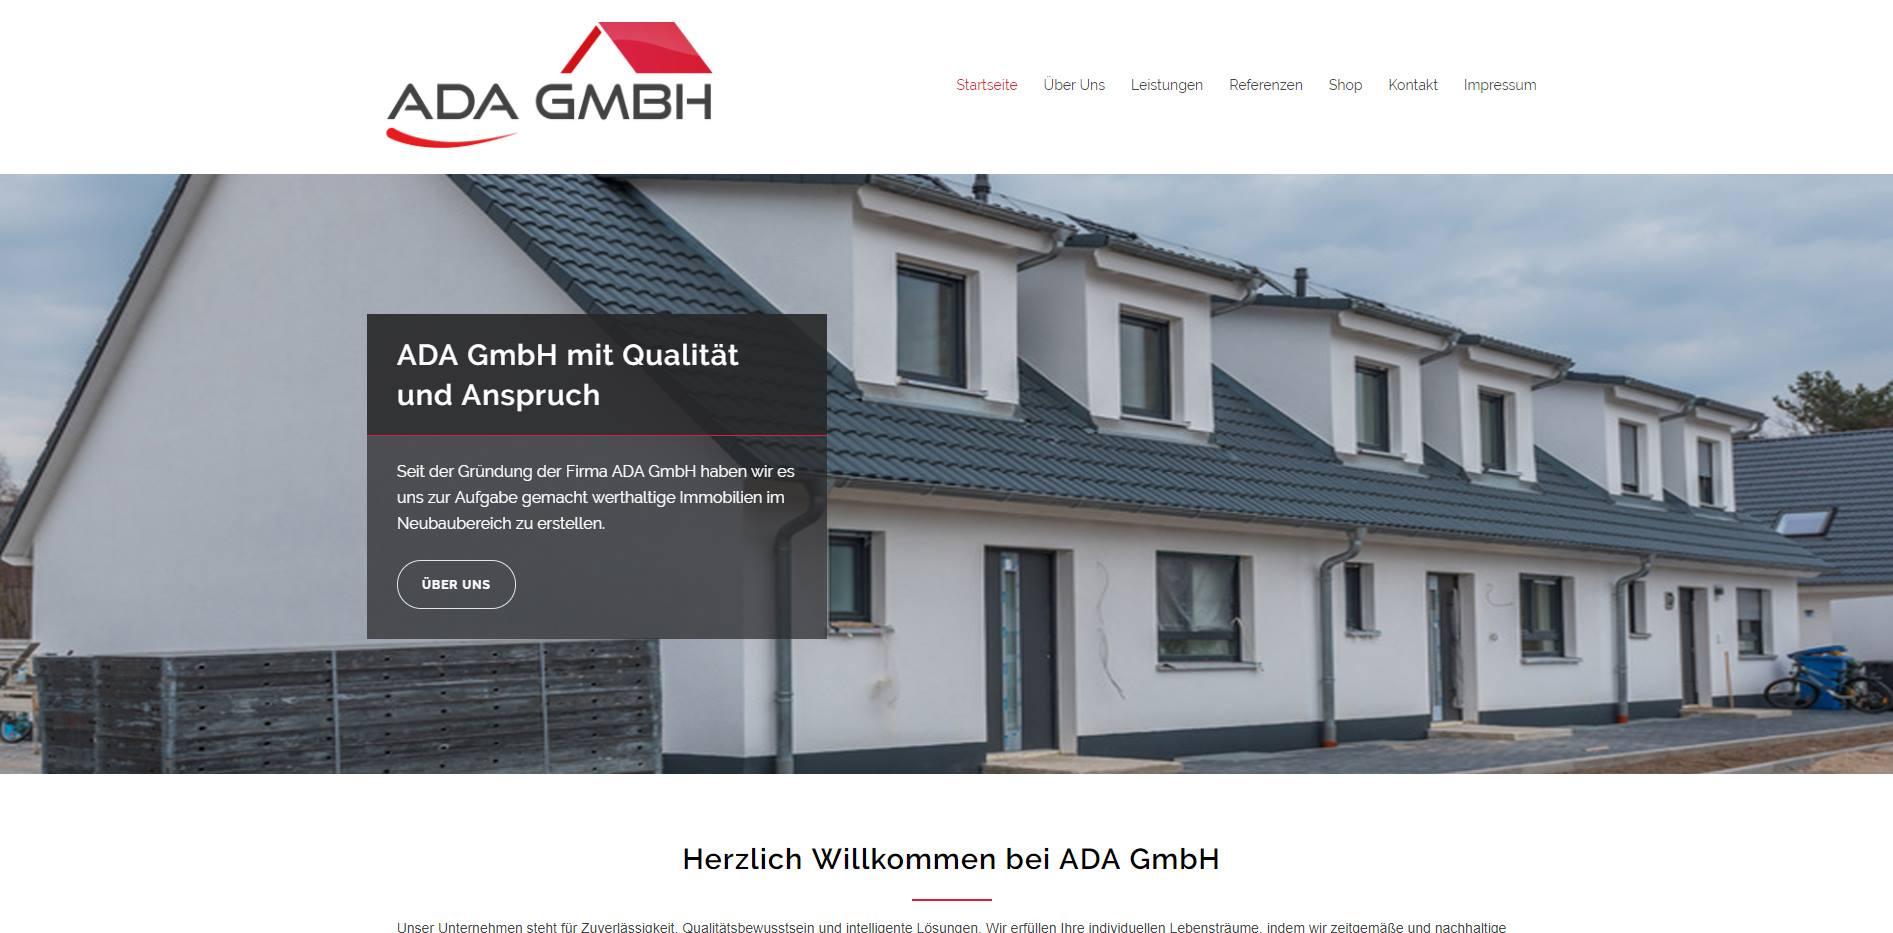 ADA GmbH